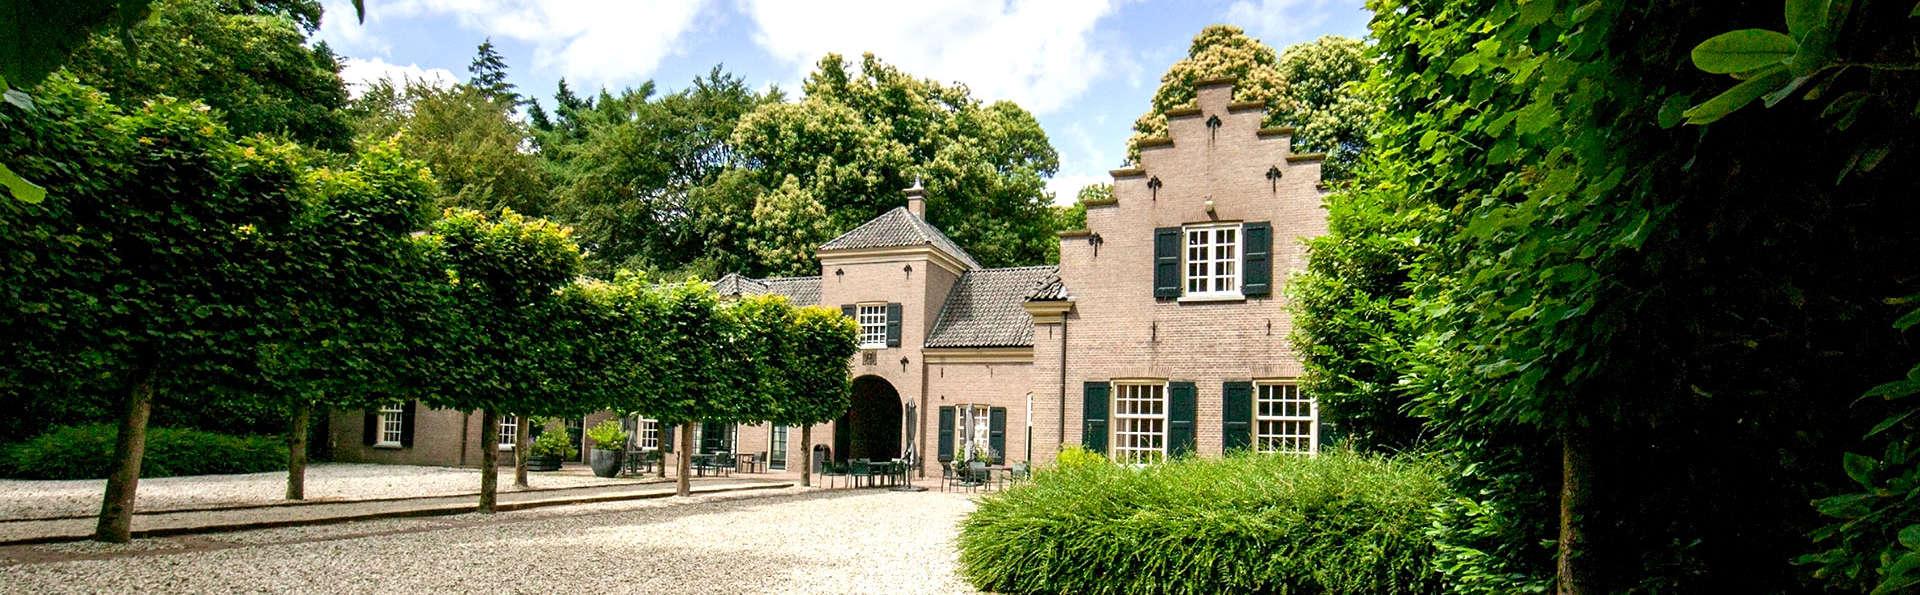 Landgoed Zonheuvel - EDIT_NEW2_FRONT2.jpg